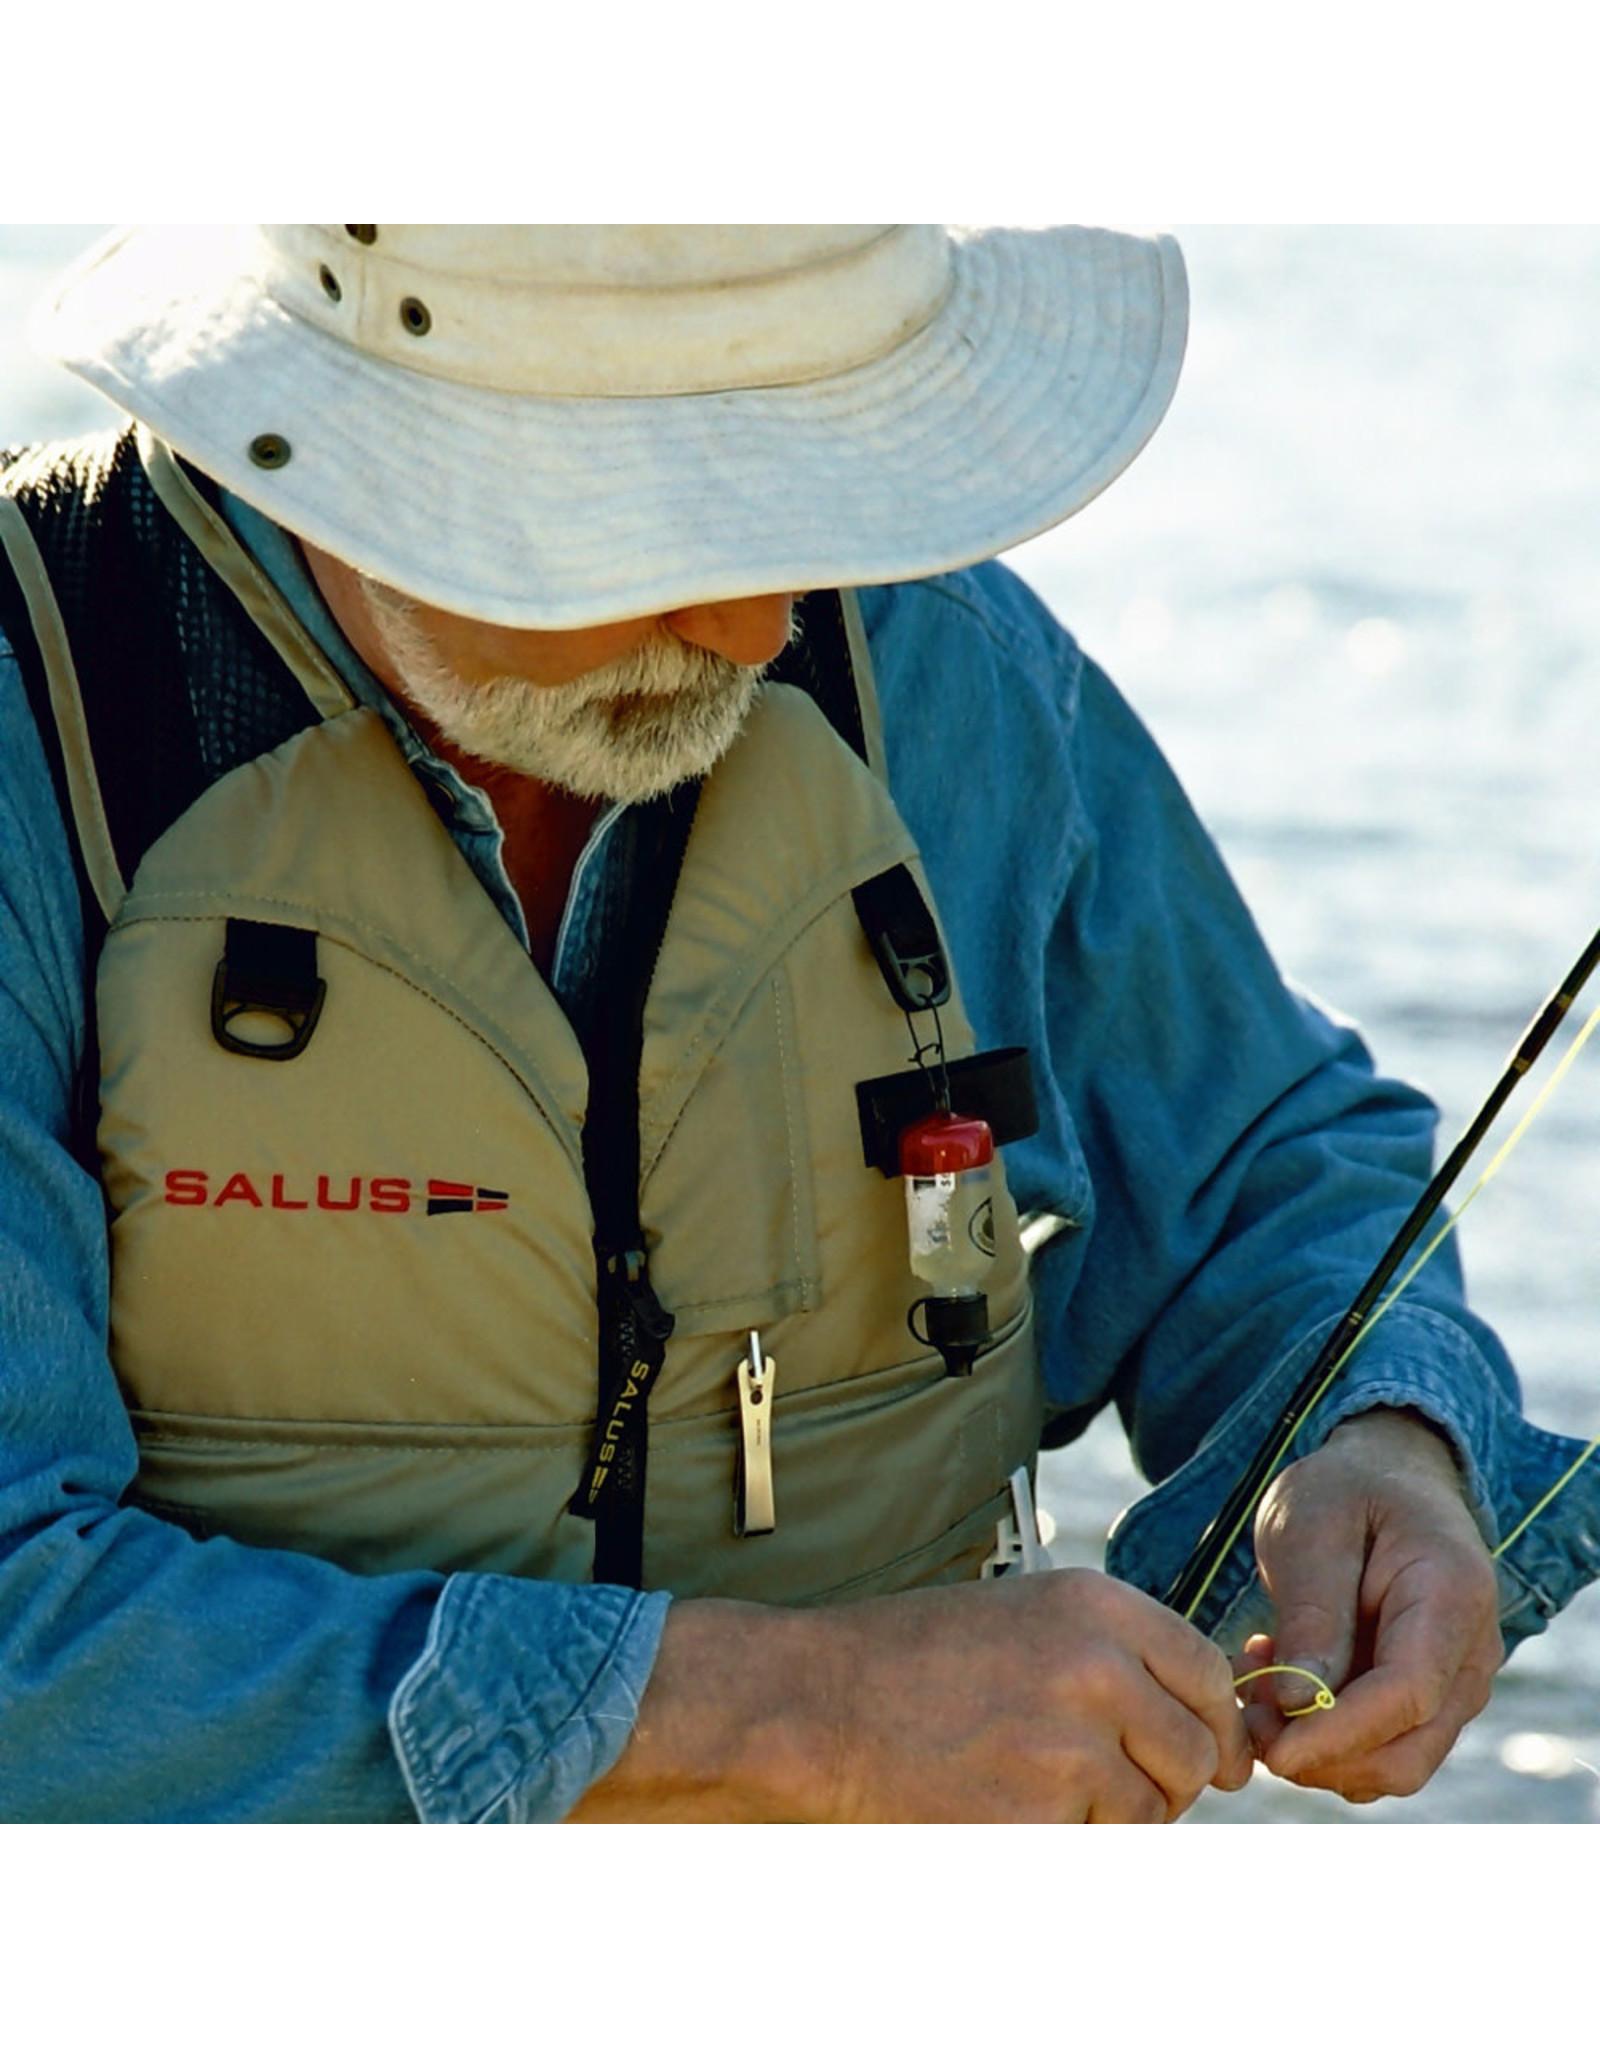 Salus Salus Angler PFD